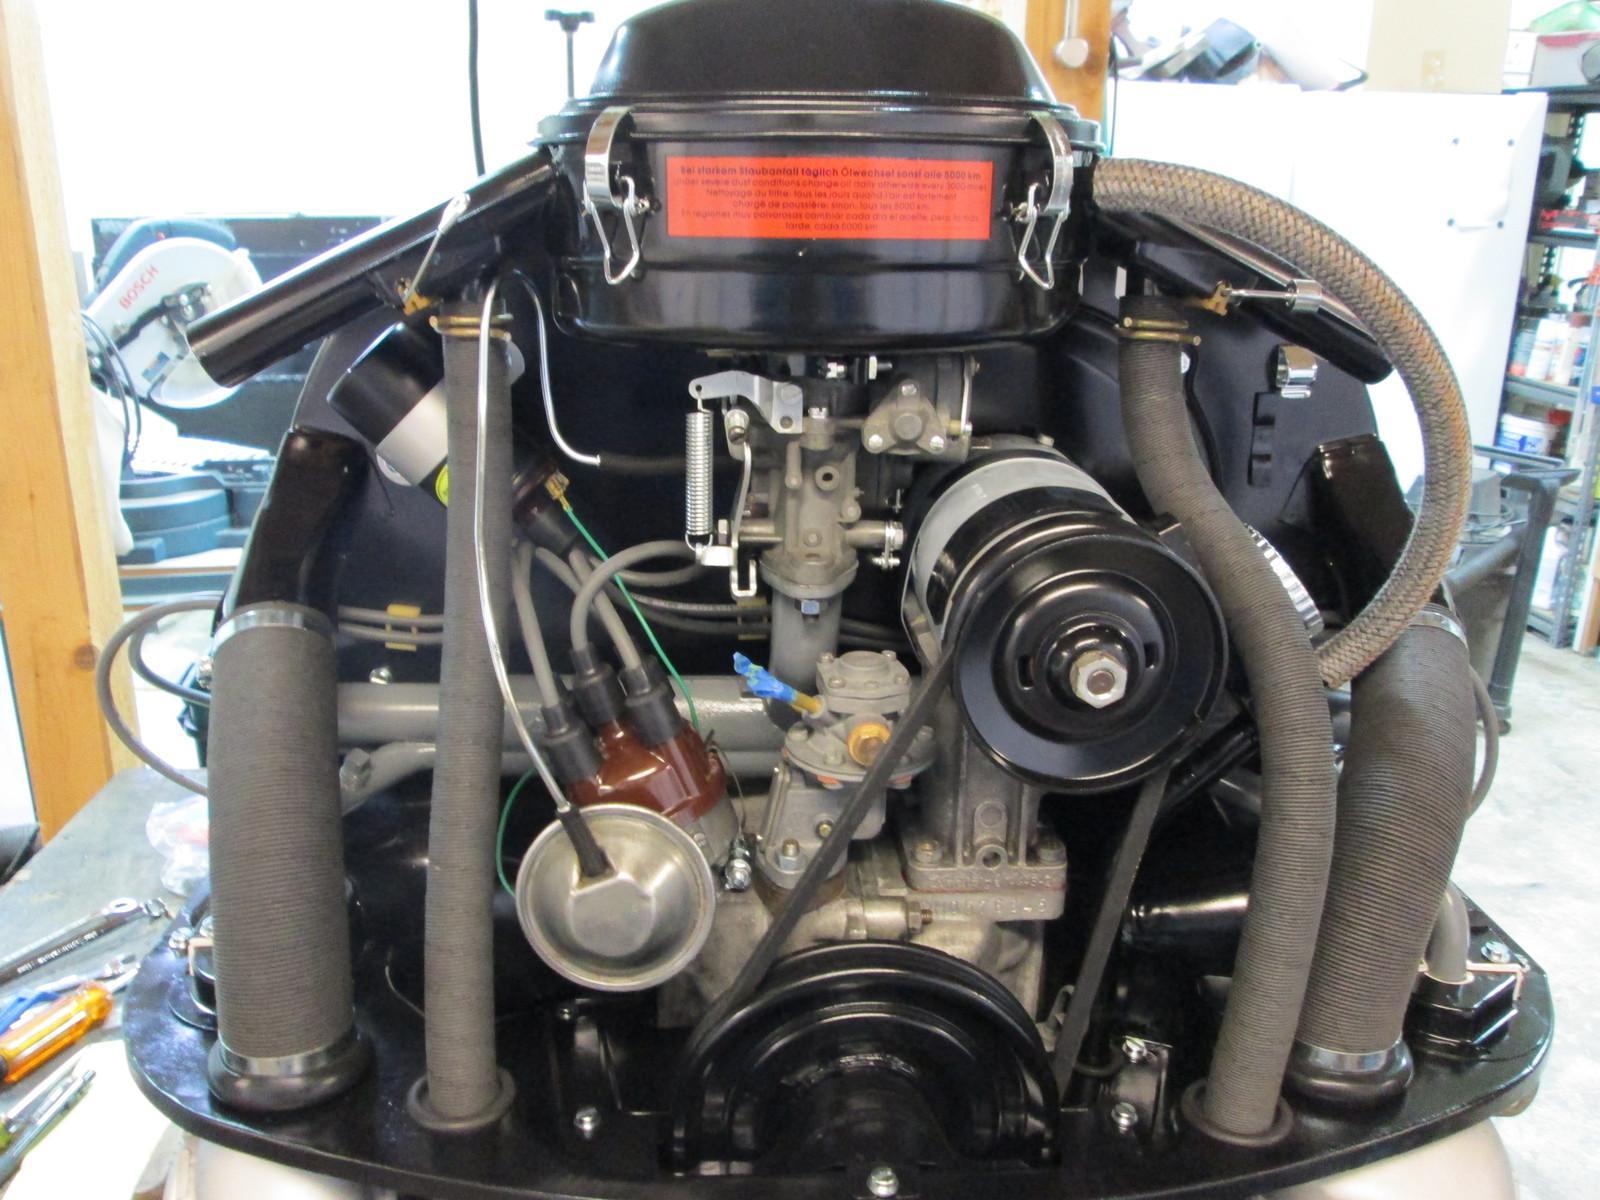 [XOTG_4463]  1974 Vw Beetle Engine Tin Diagram | Wiring Library | Vw Beetle Engine Tin Diagram |  | Wiring Resources